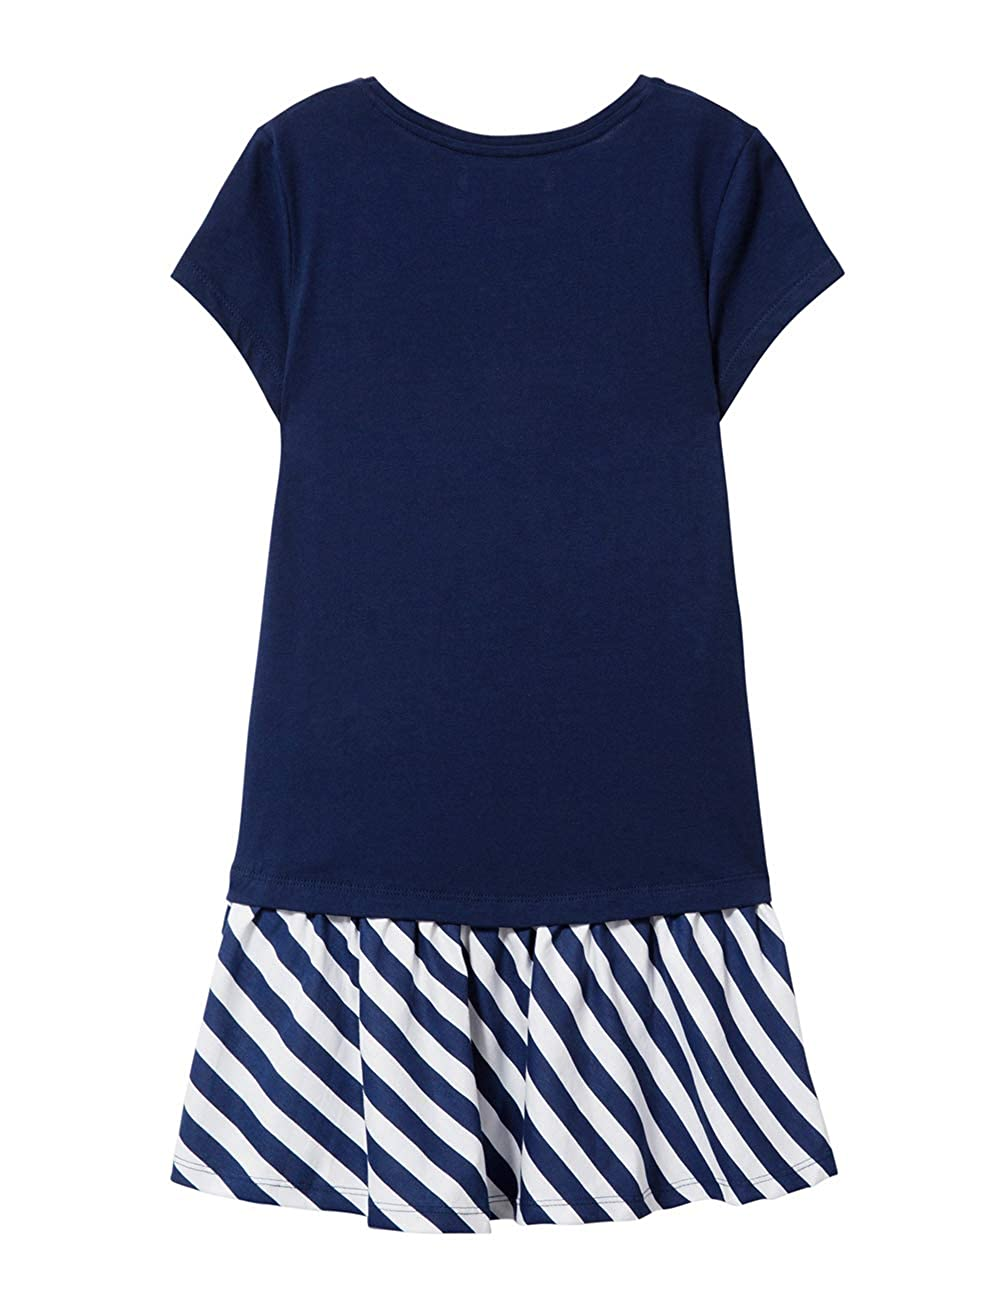 Desigual Girl Knit Dress Short Sleeve Vest/_Carson Vestido para Ni/ñas